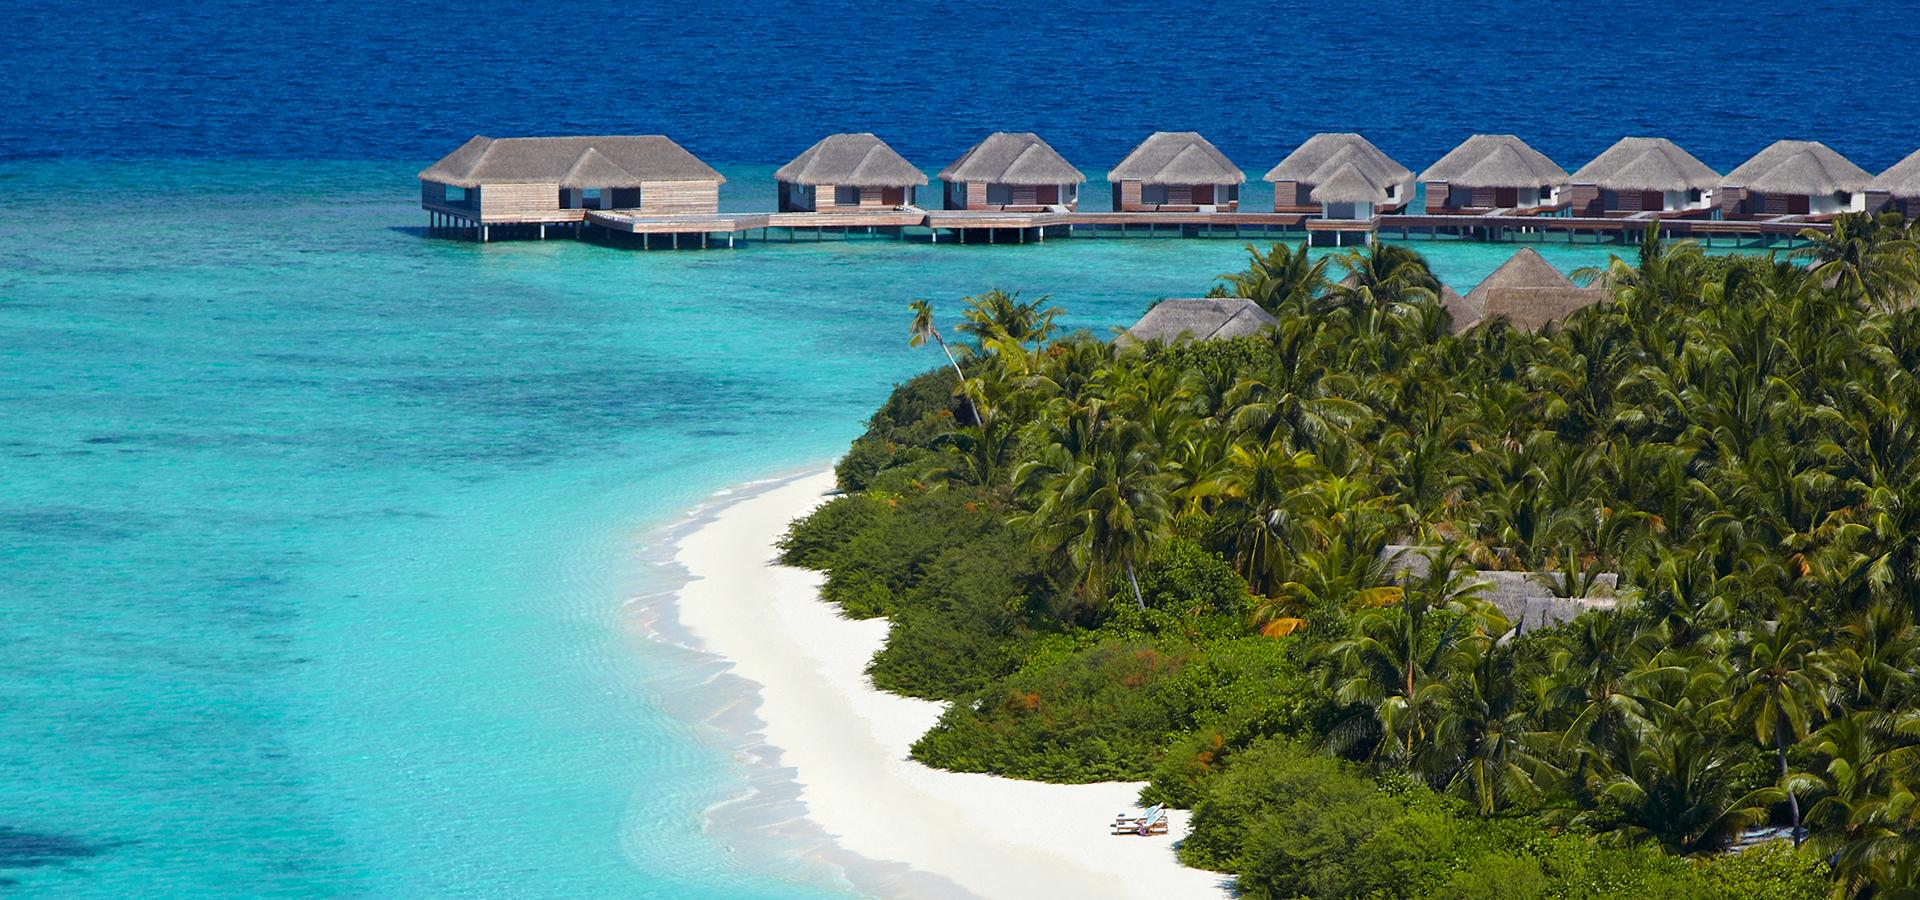 hotel luxe maldive instagram